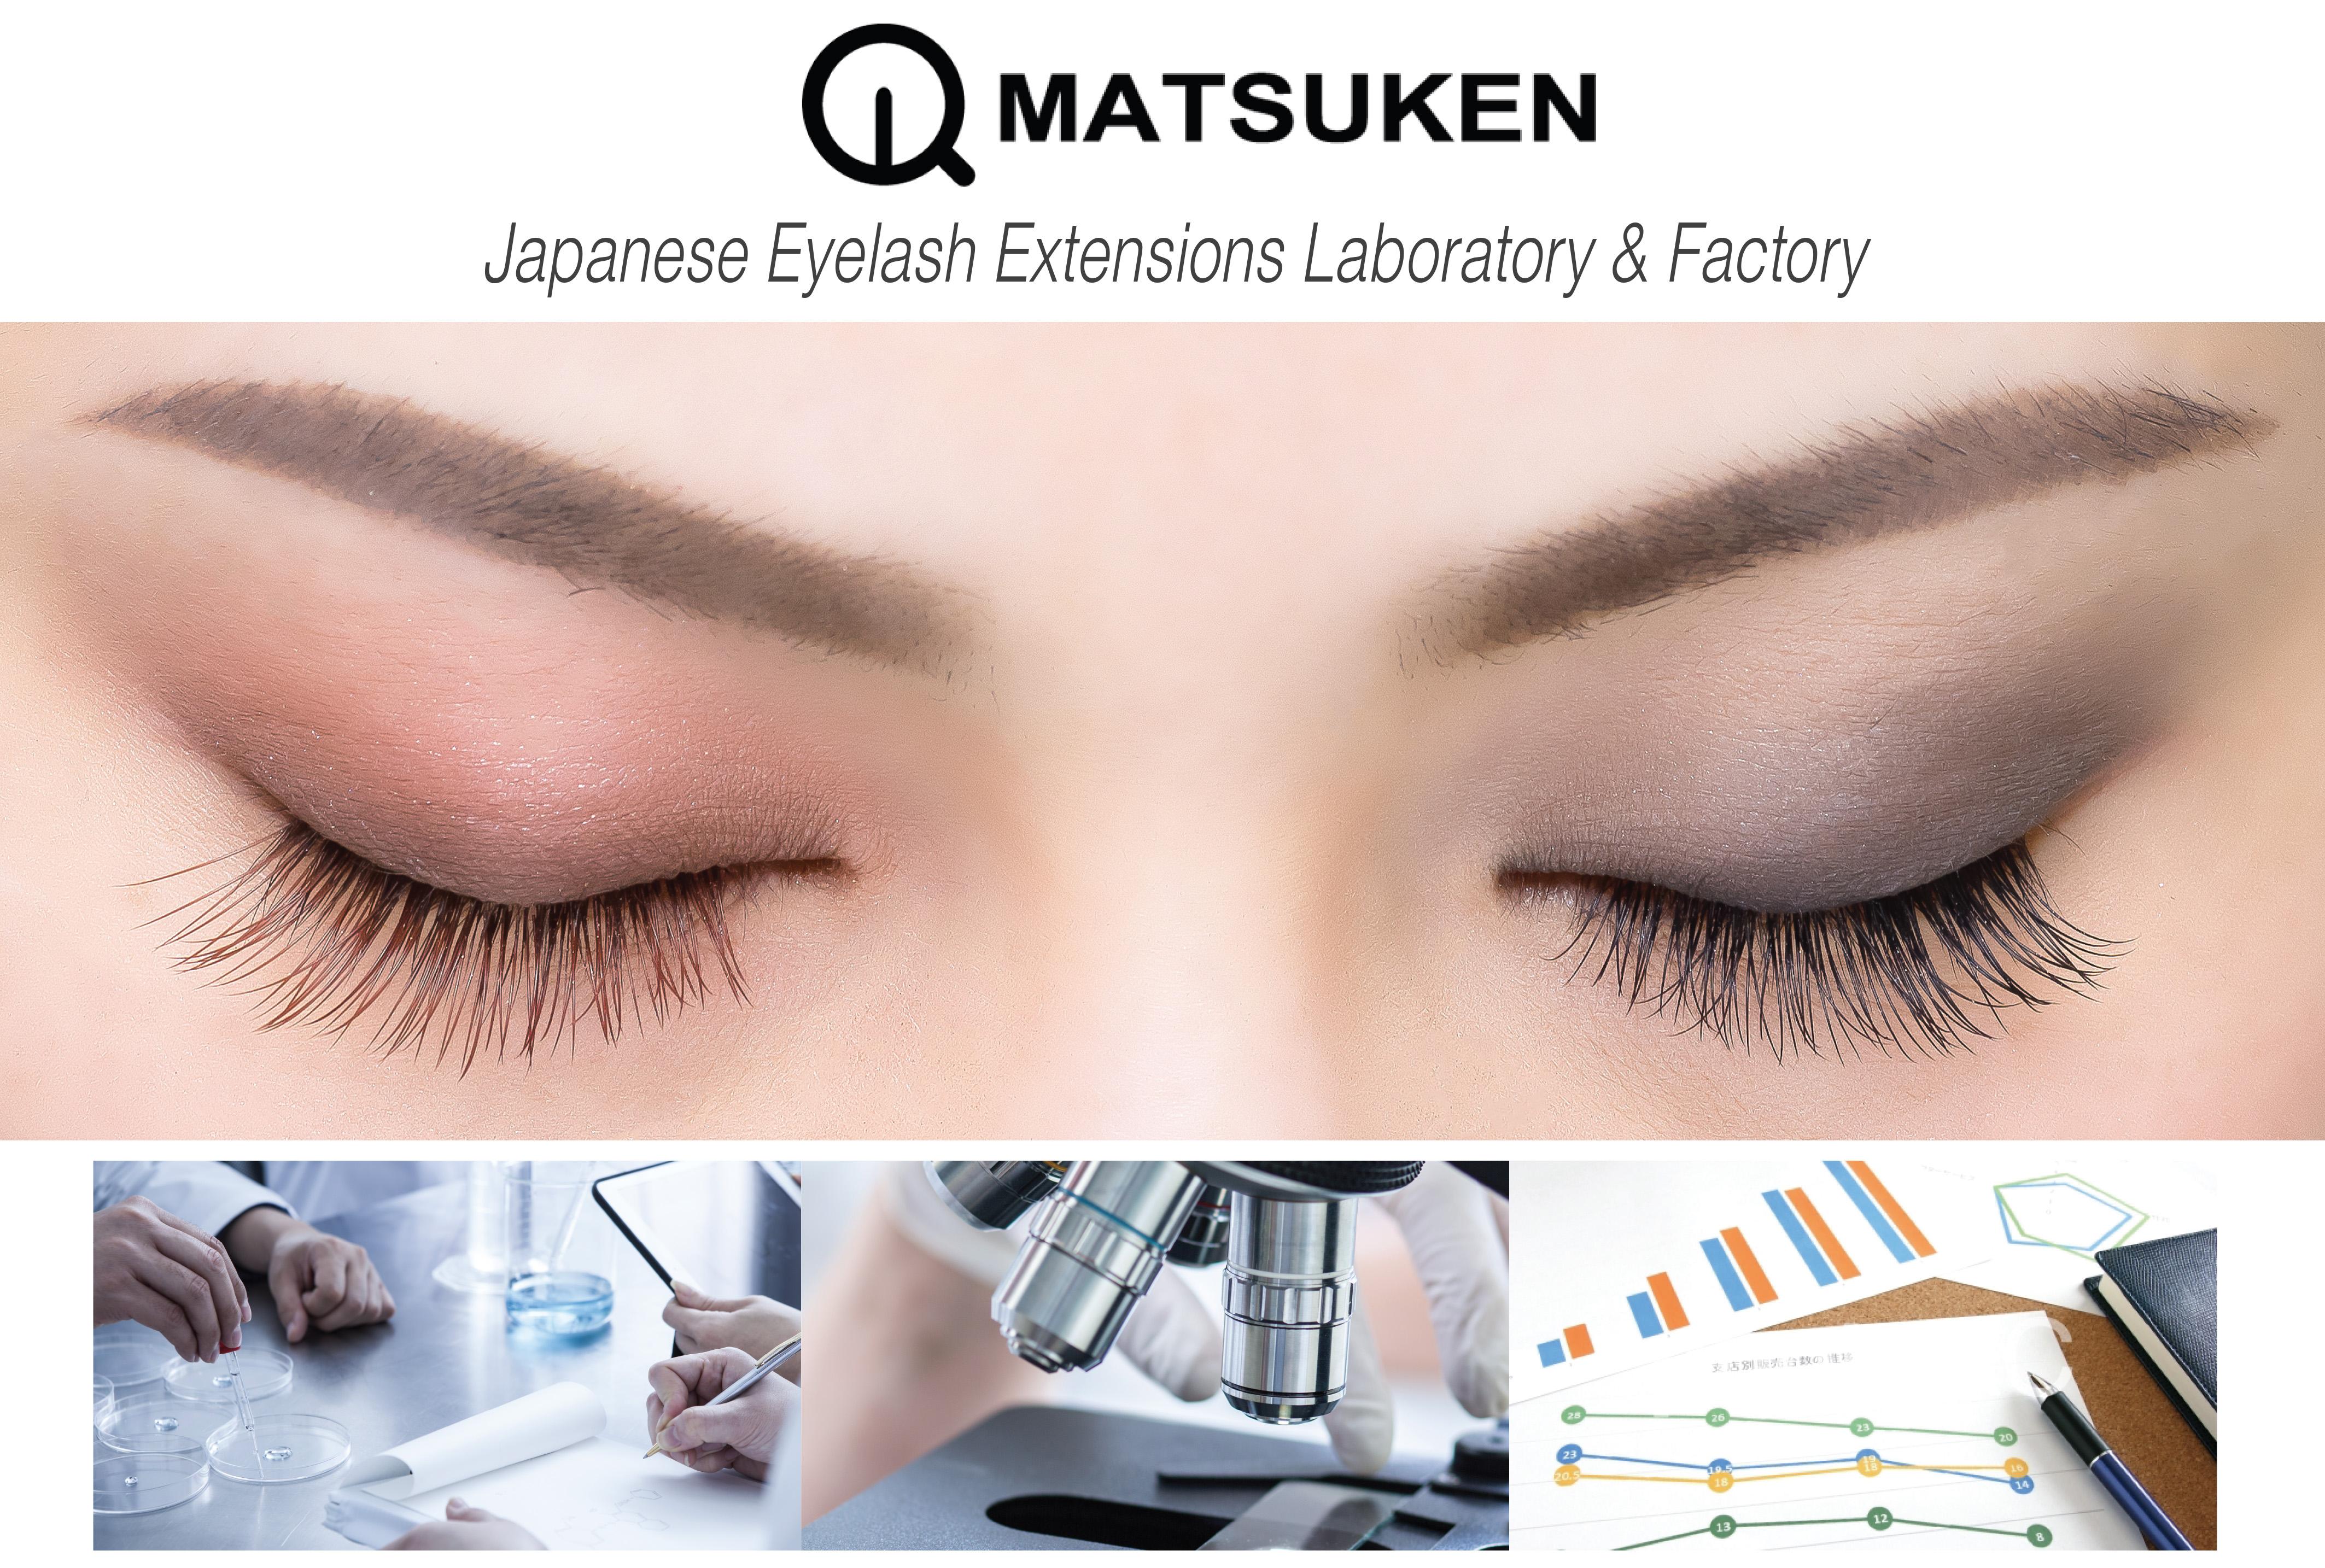 https://www.japancosmeticsexperience.com/wp-content/uploads/2019/01/MATSUKEN-PR-Copia.jpg